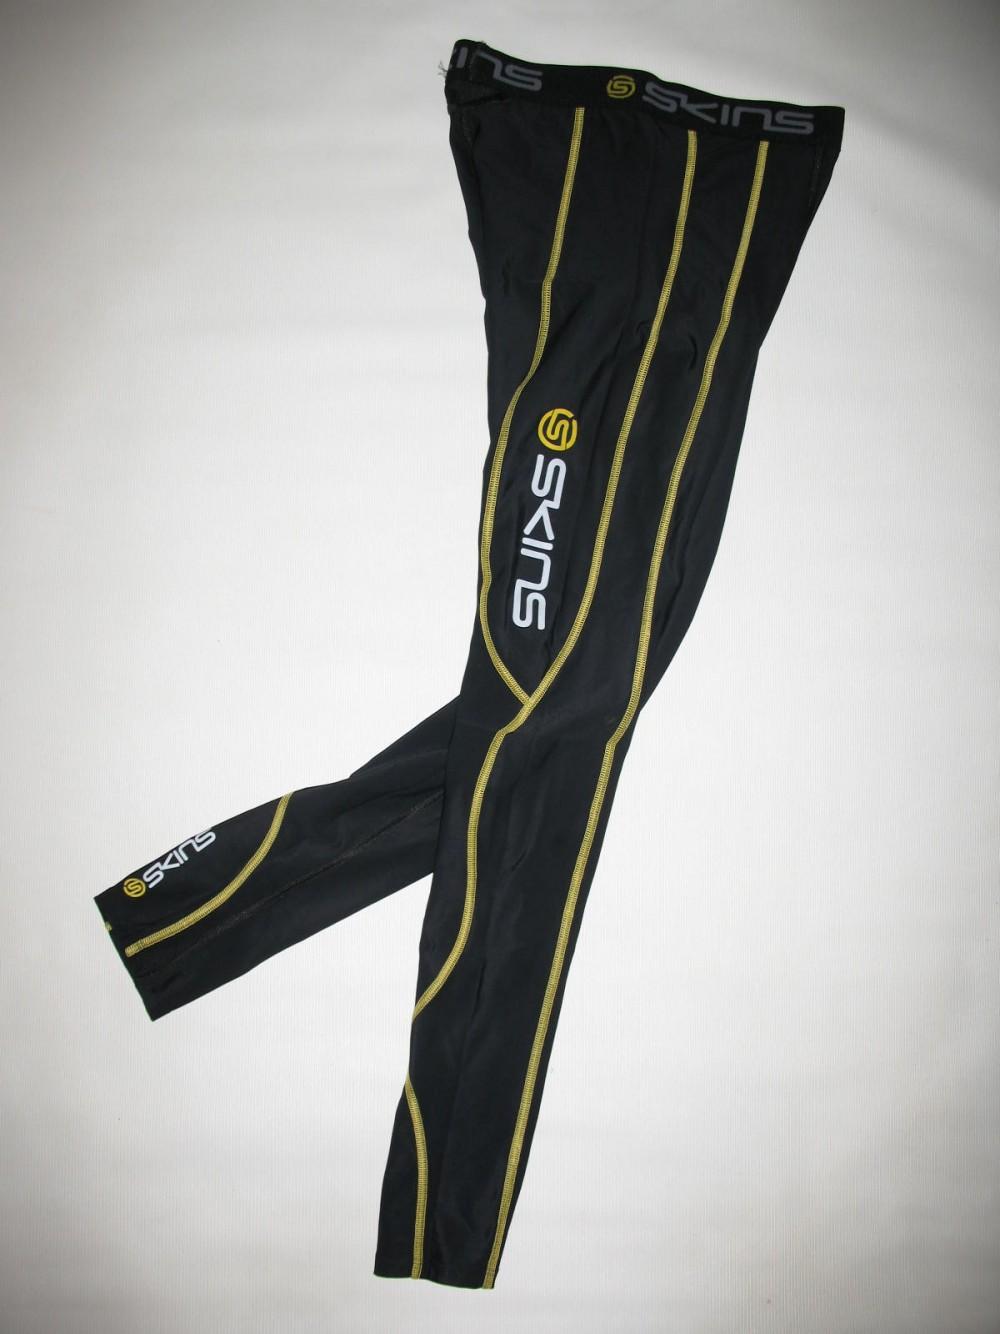 Футболка+брюки SKINS A200 compression long sleeves jersey+long tights (размер M) - 3